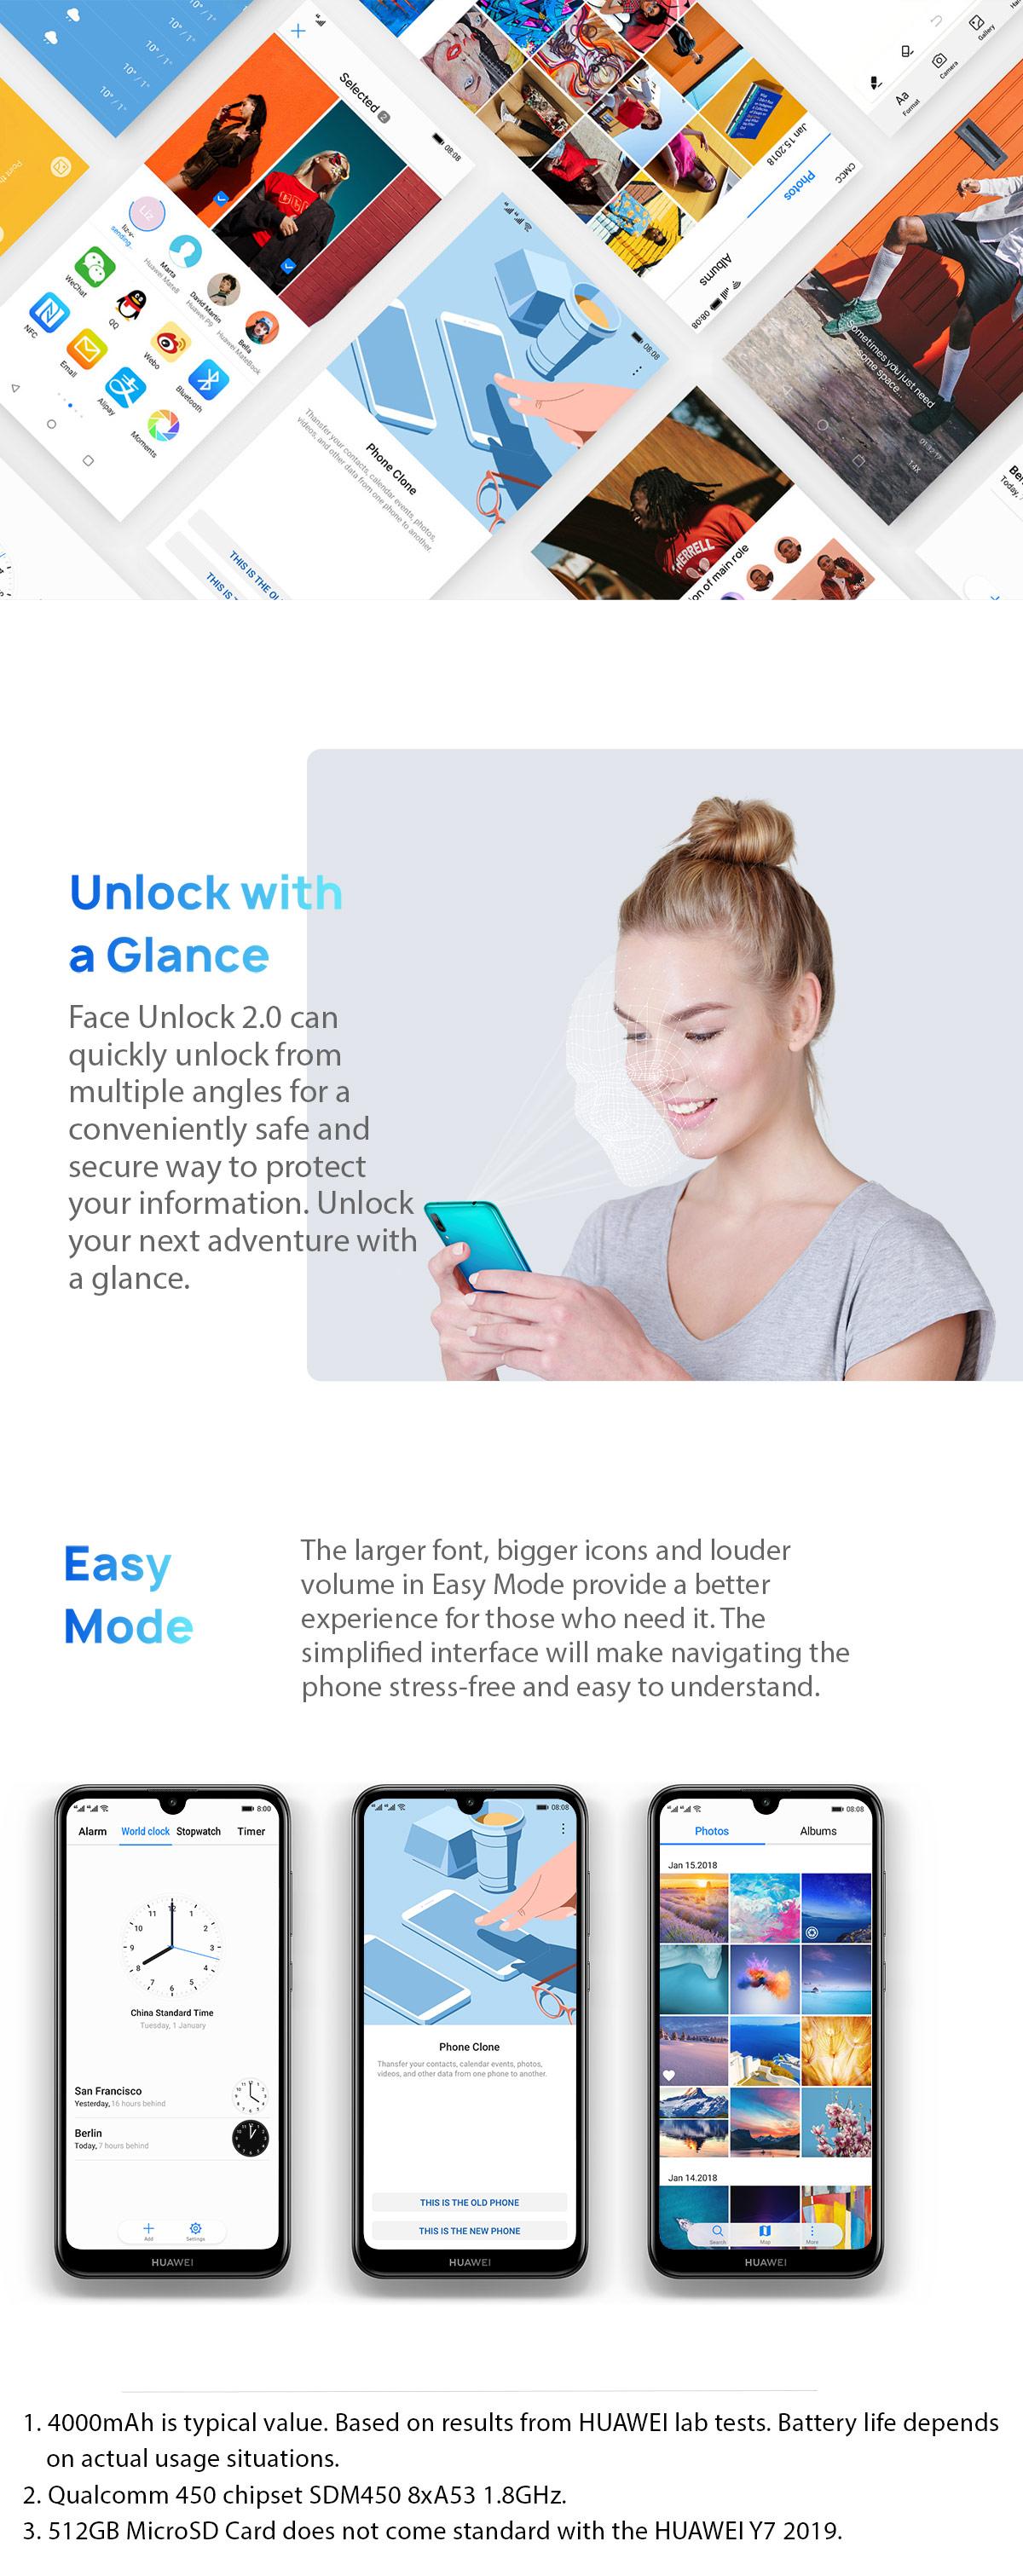 Huawei Y7 Pro 2019 32GB — 3GB 6 26 inches HD+ Screen Smart Phone